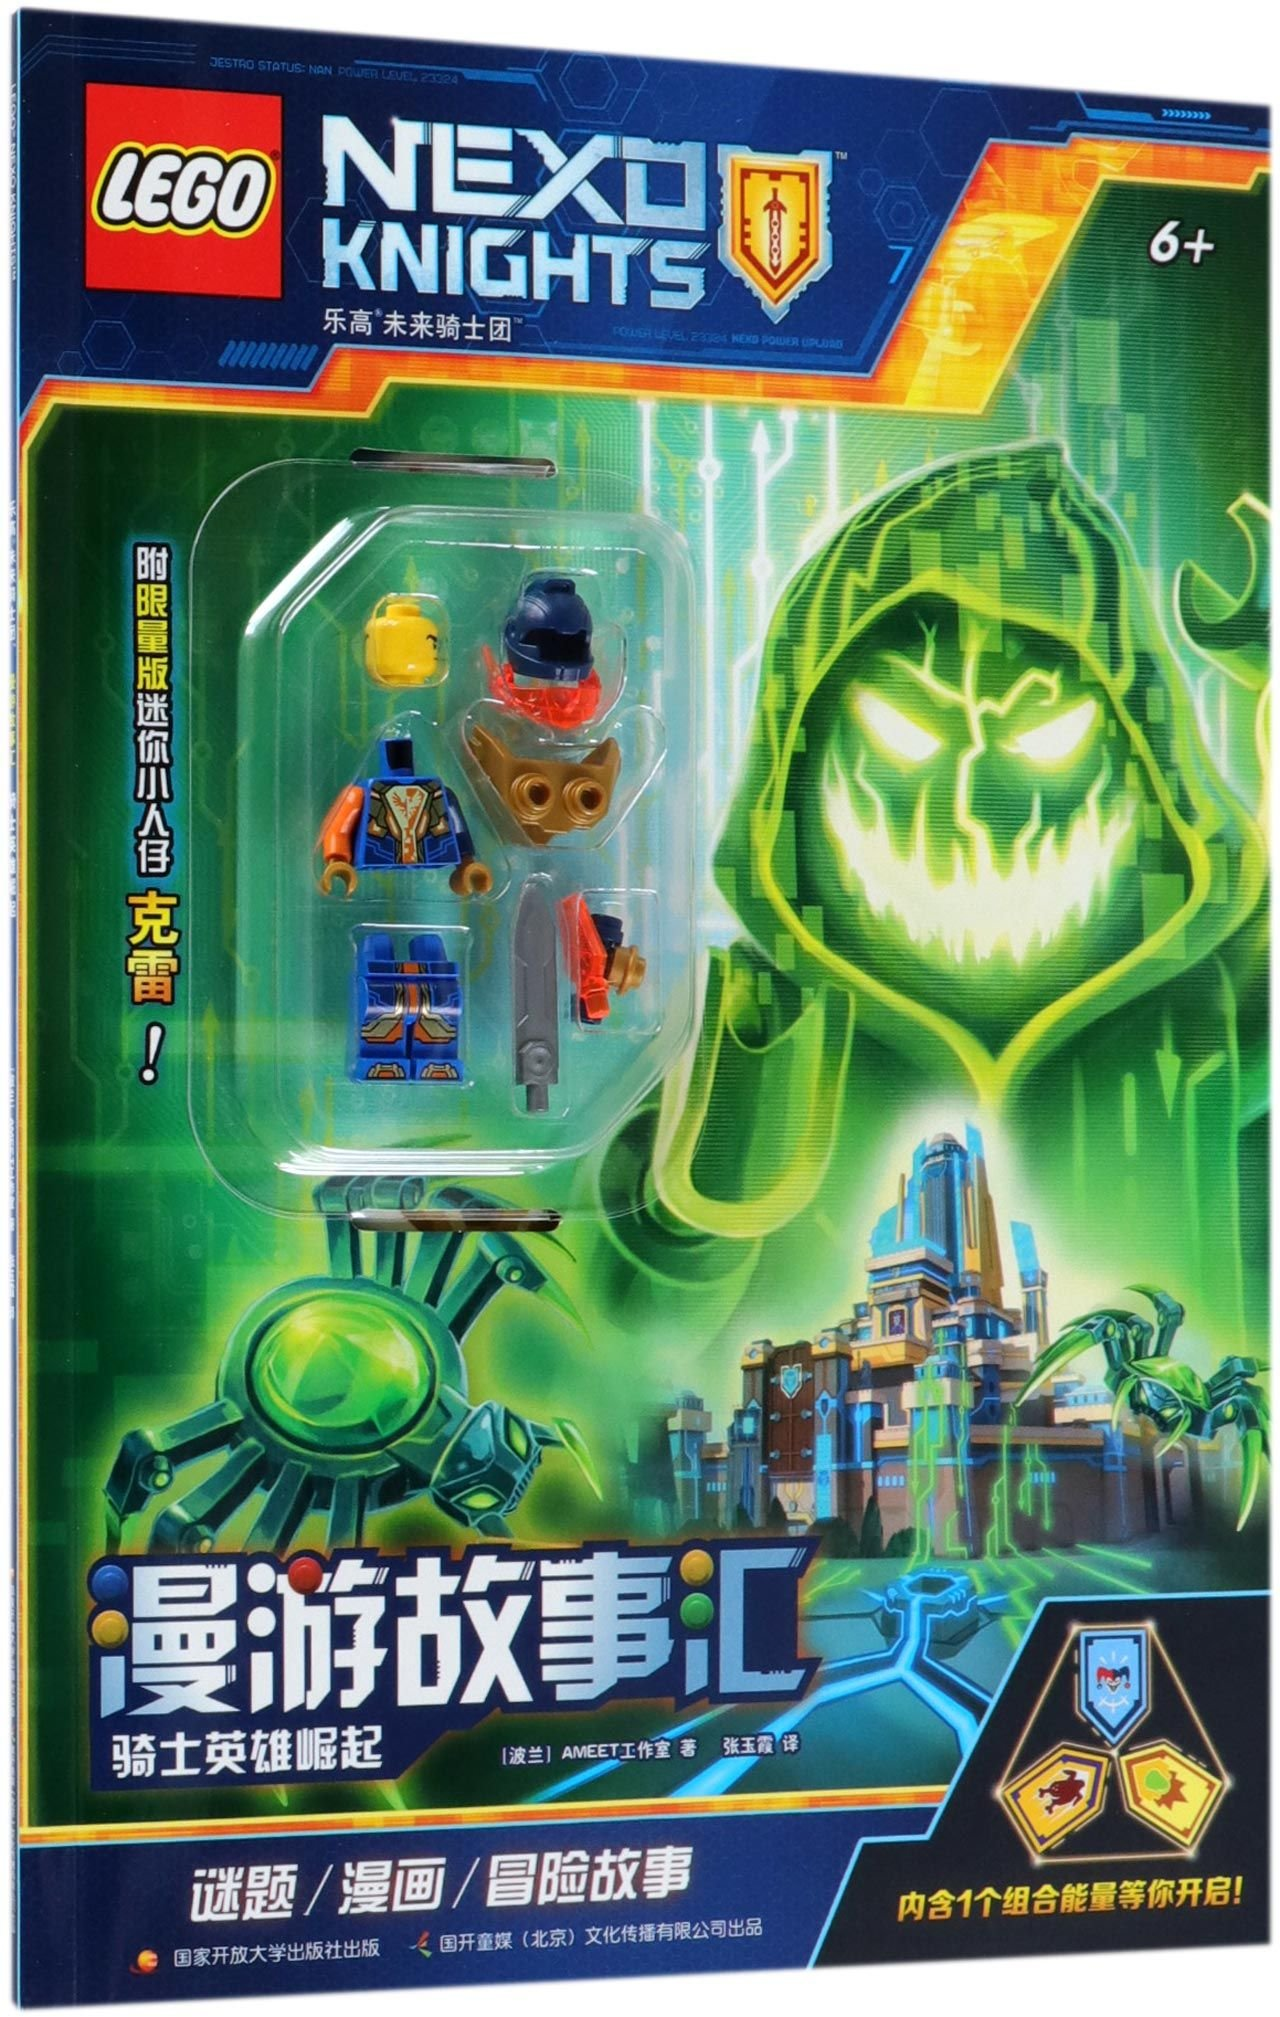 Lego Nexo Knights (6+) (Chinese Edition)